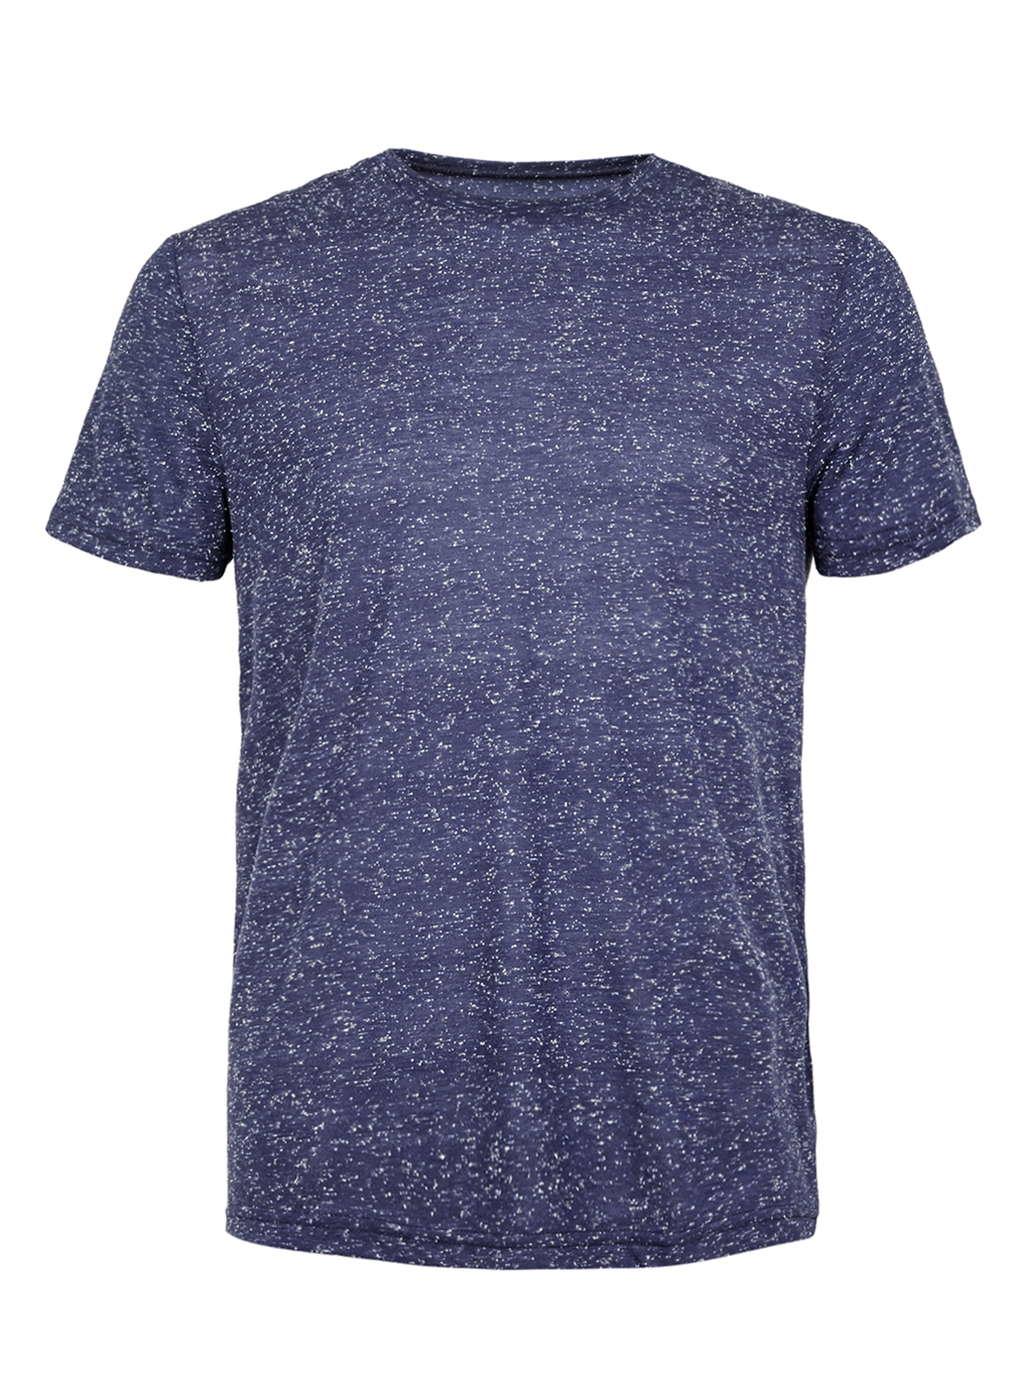 Topman navy neppy slim fit t shirt in blue for men lyst for Navy slim fit shirt